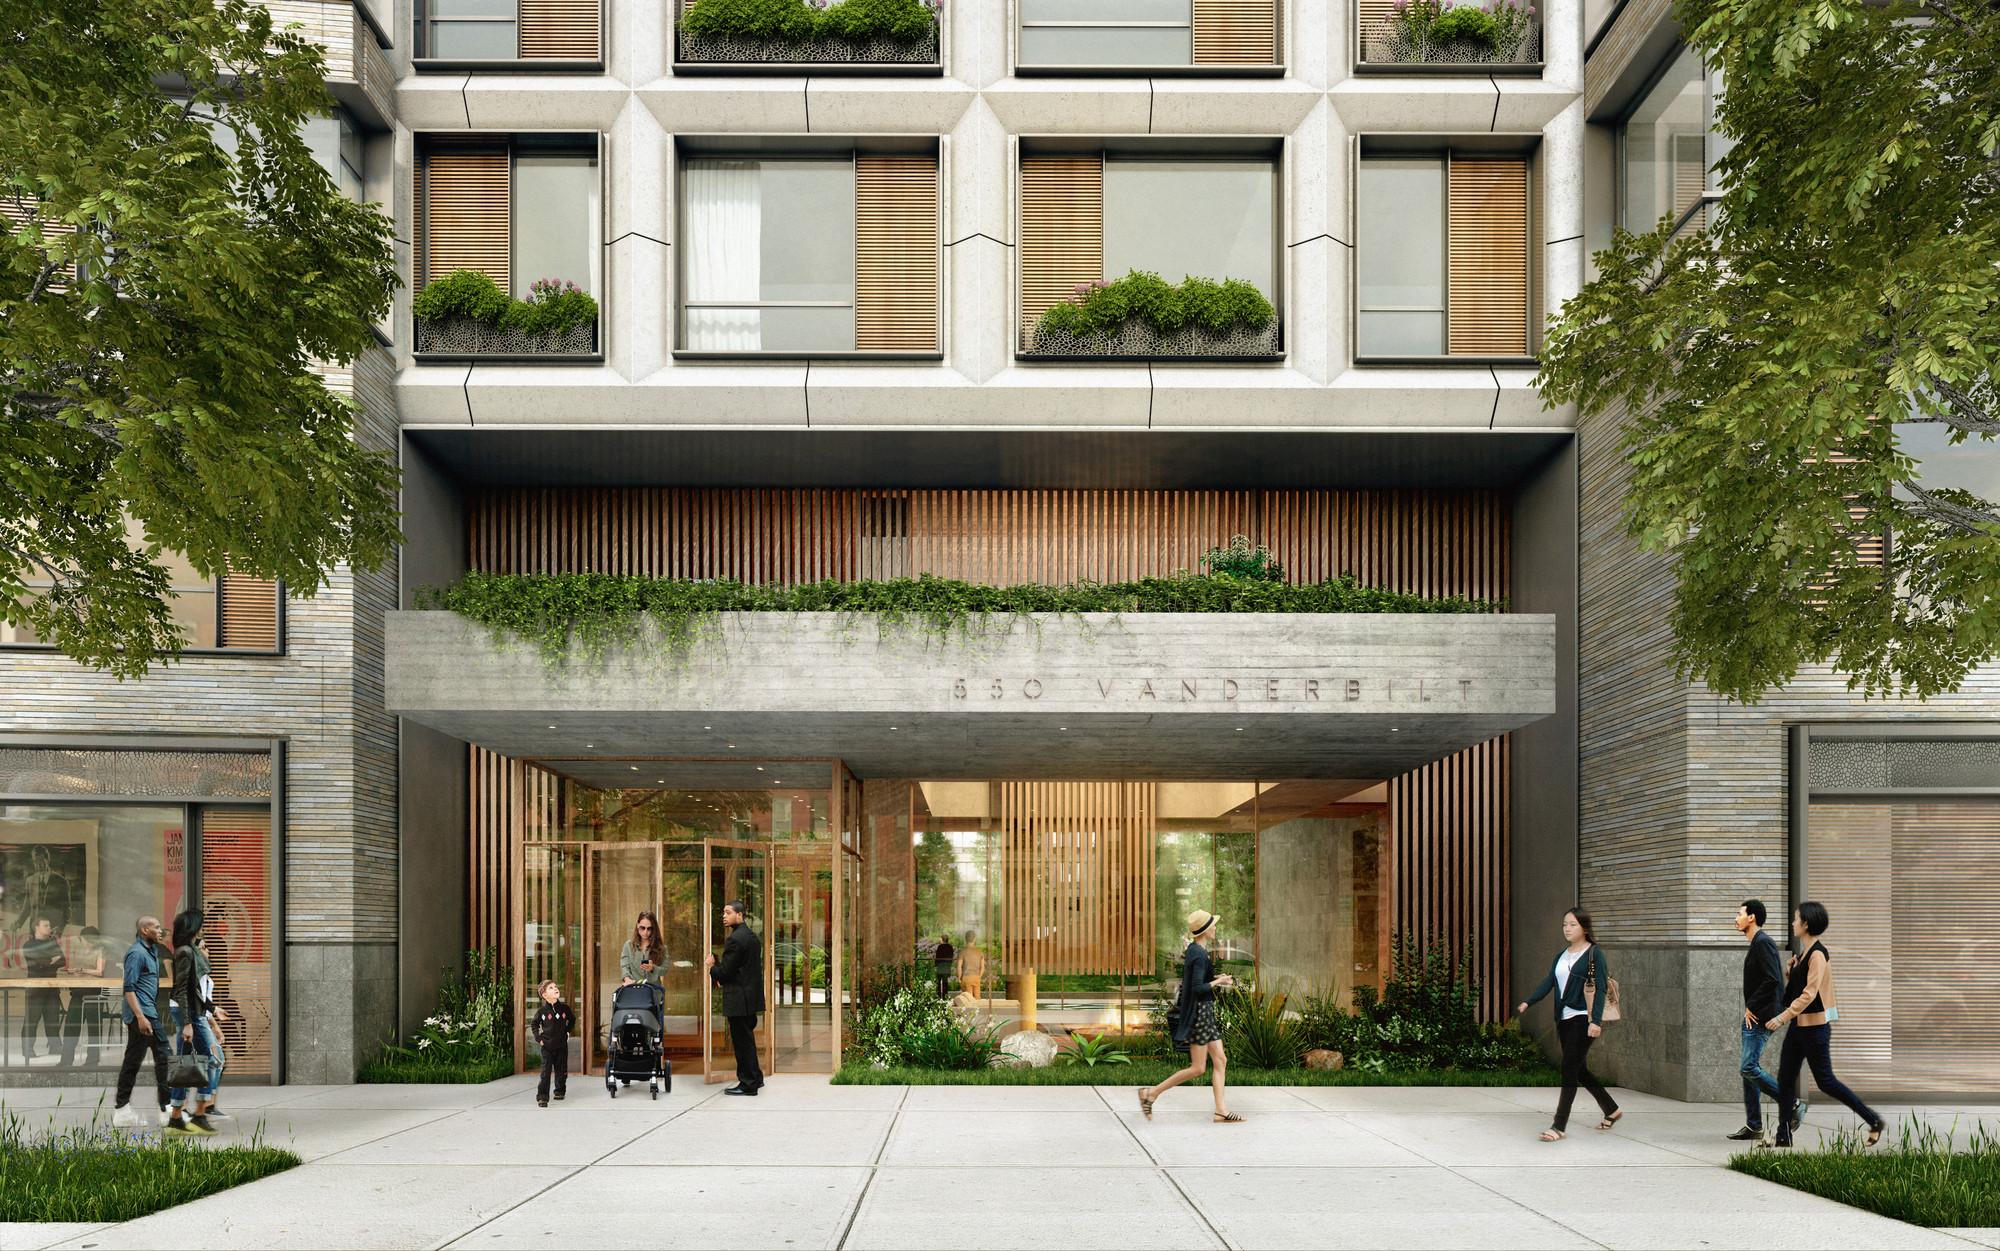 Cookfox Architects 550 Vanderbilt Condo Opens For Sale